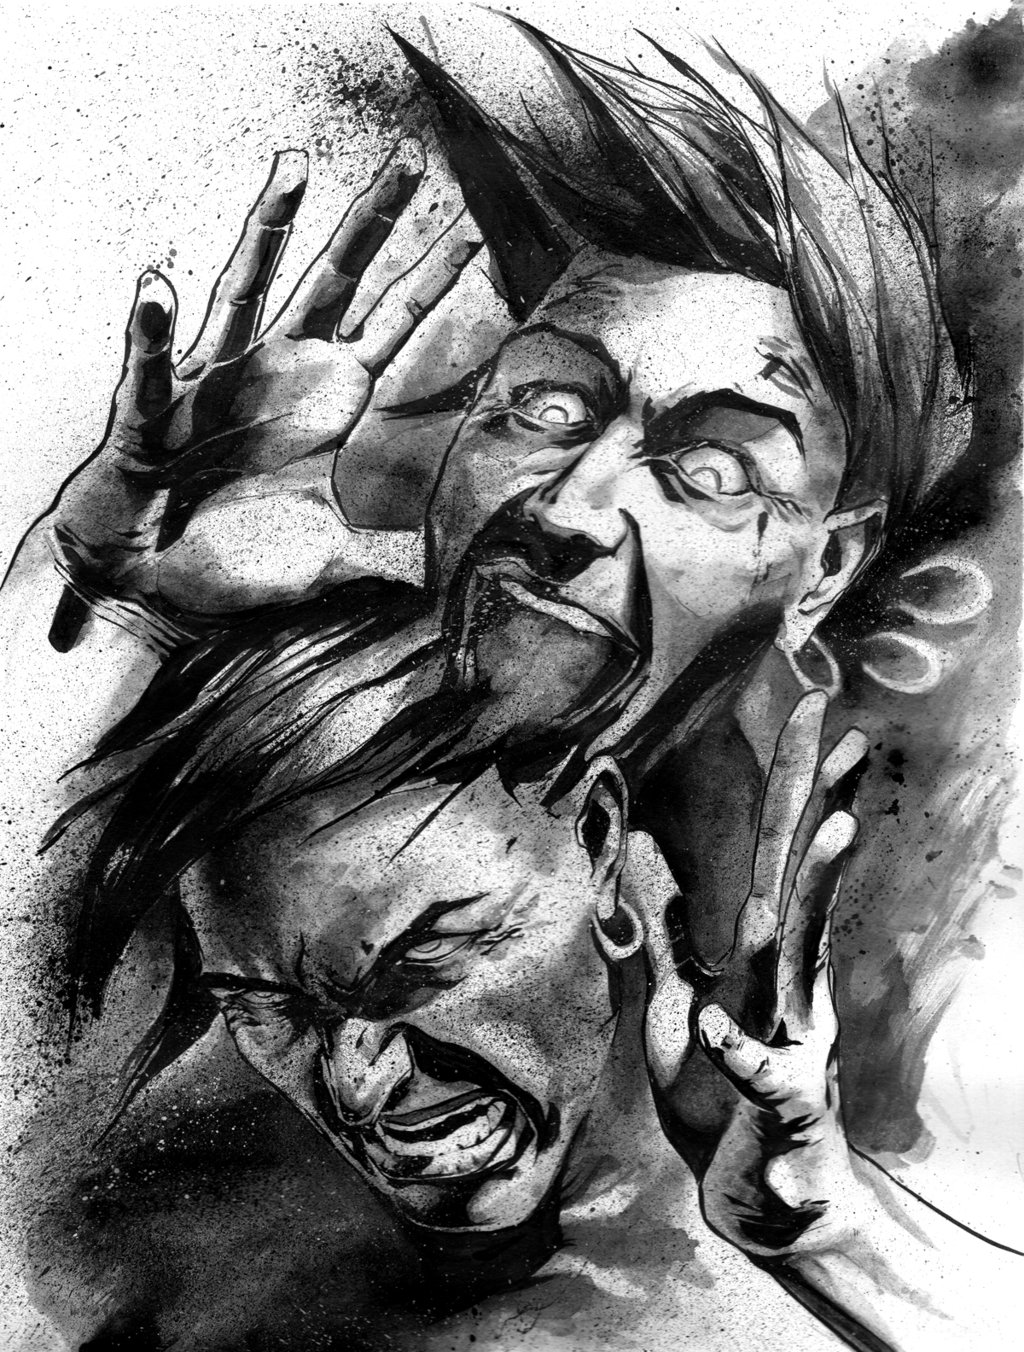 schizophrenia_by_valeriobefani-d5r4unj